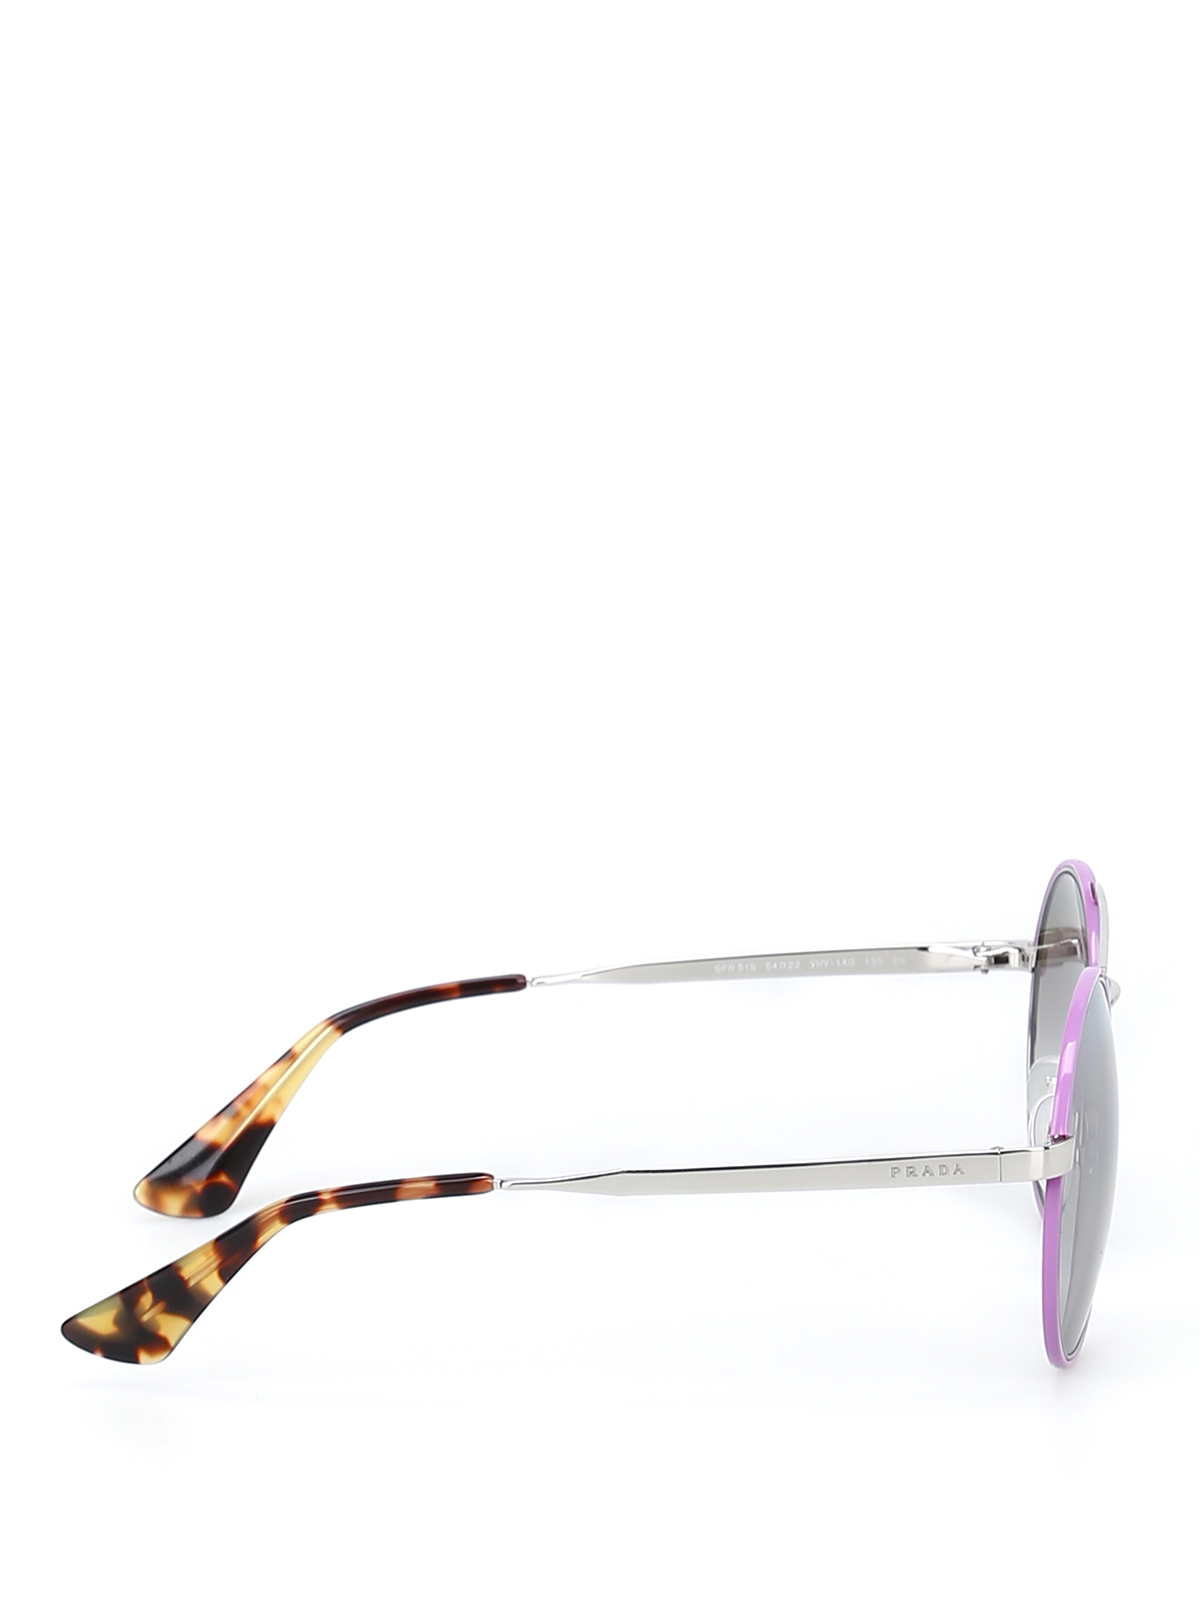 238b9cdb122 Prada - Cinéma light purple sunglasses - sunglasses - SPR 51S VHV 1A0